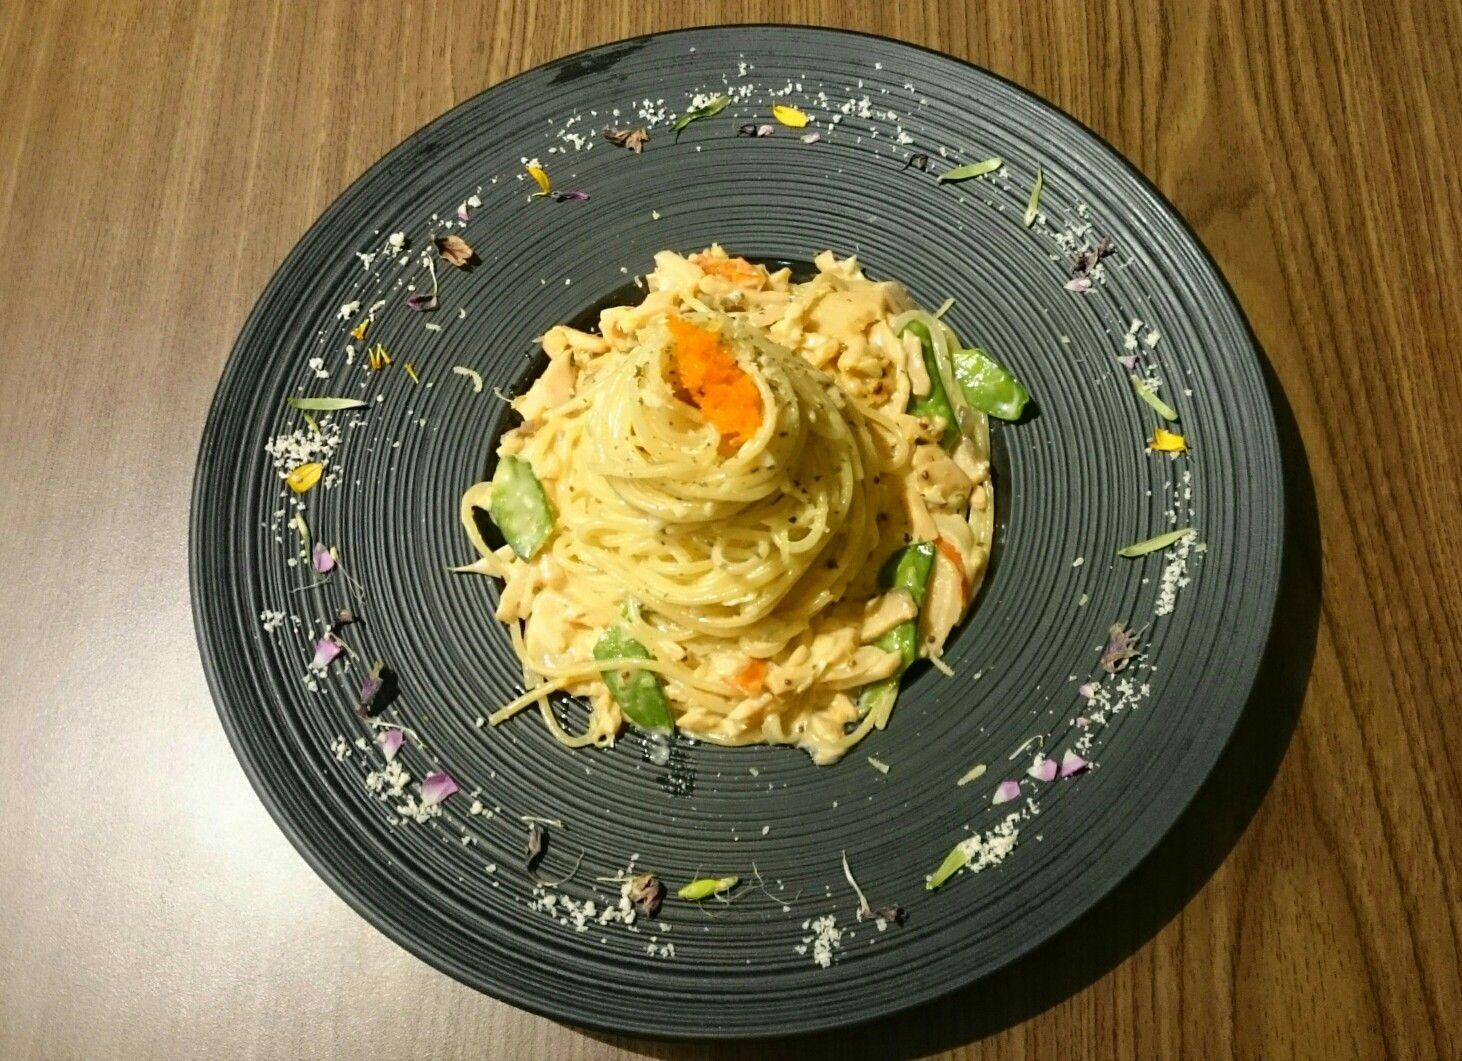 Mories茉莉絲義思廚房。煙燻鮭魚佐明太子奶油白醬義大利麵。$300 | Food. Hummus